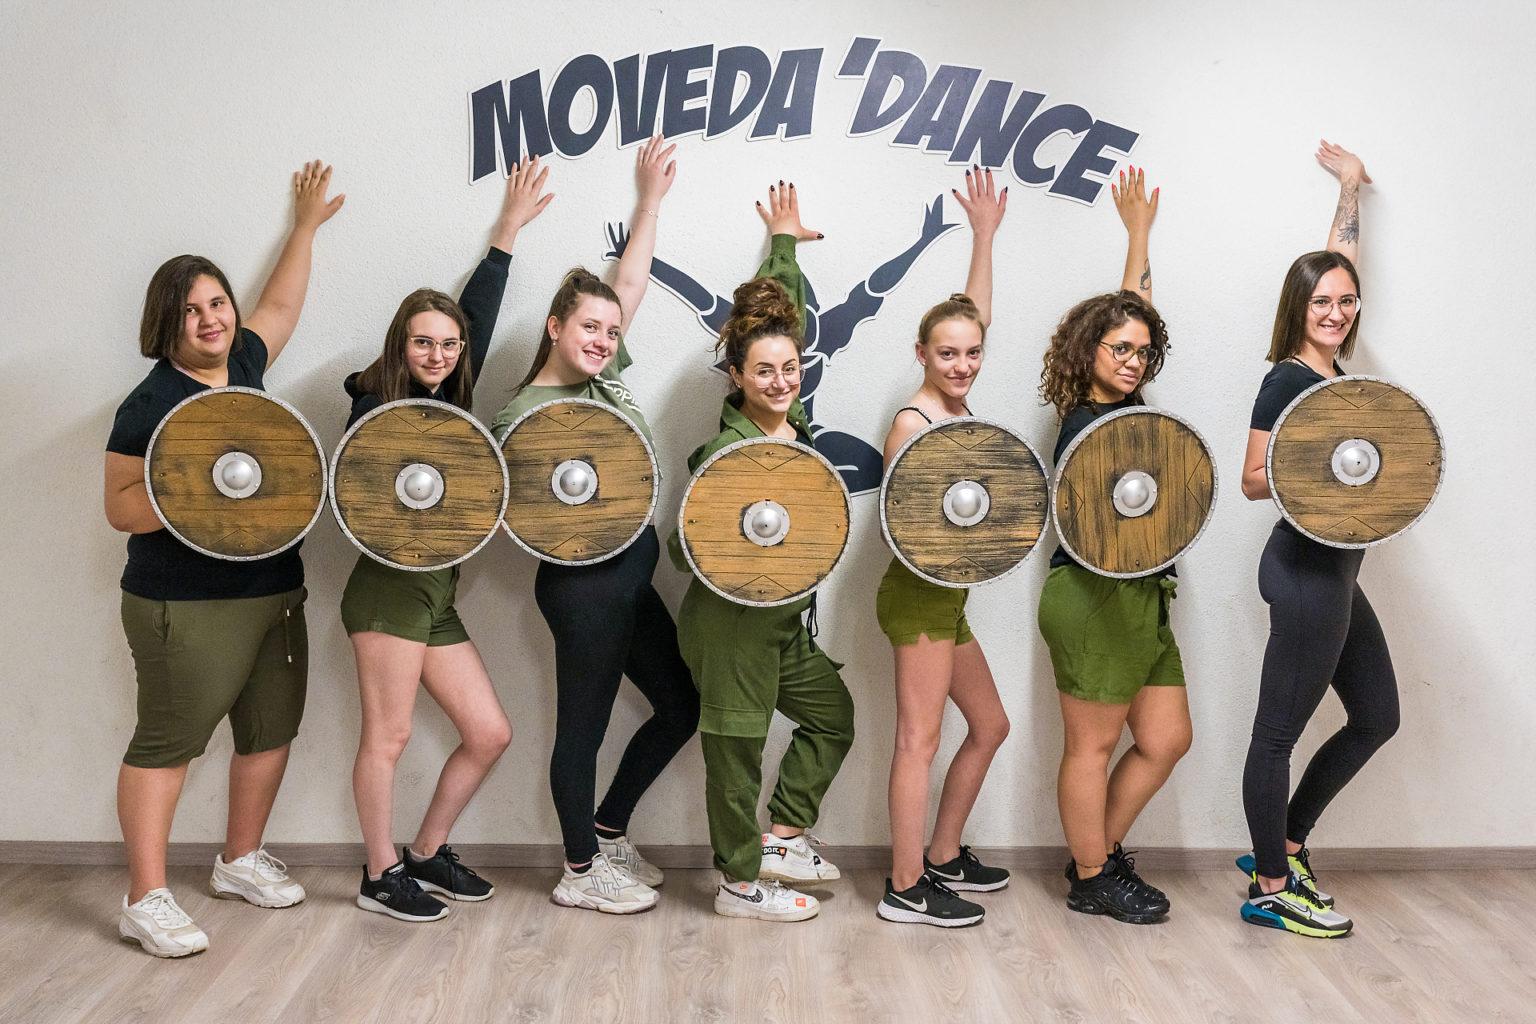 Clara Sita devant le logo de son école de danse Moveda'dance